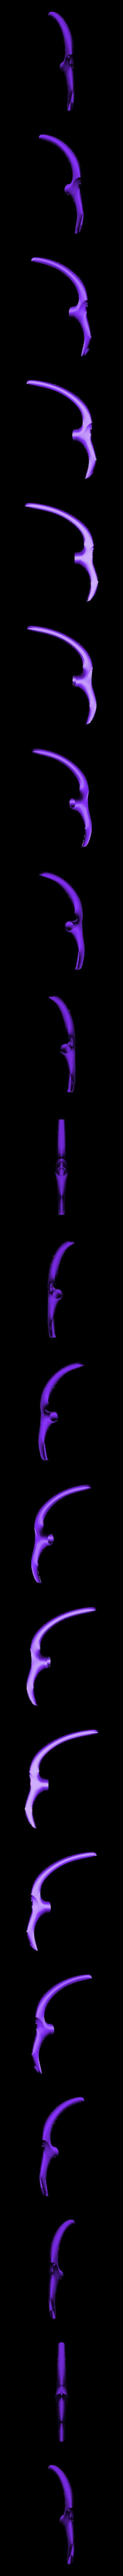 Funnel_Full.stl Download free STL file PET Bottle Funnel • 3D printer template, meshtush